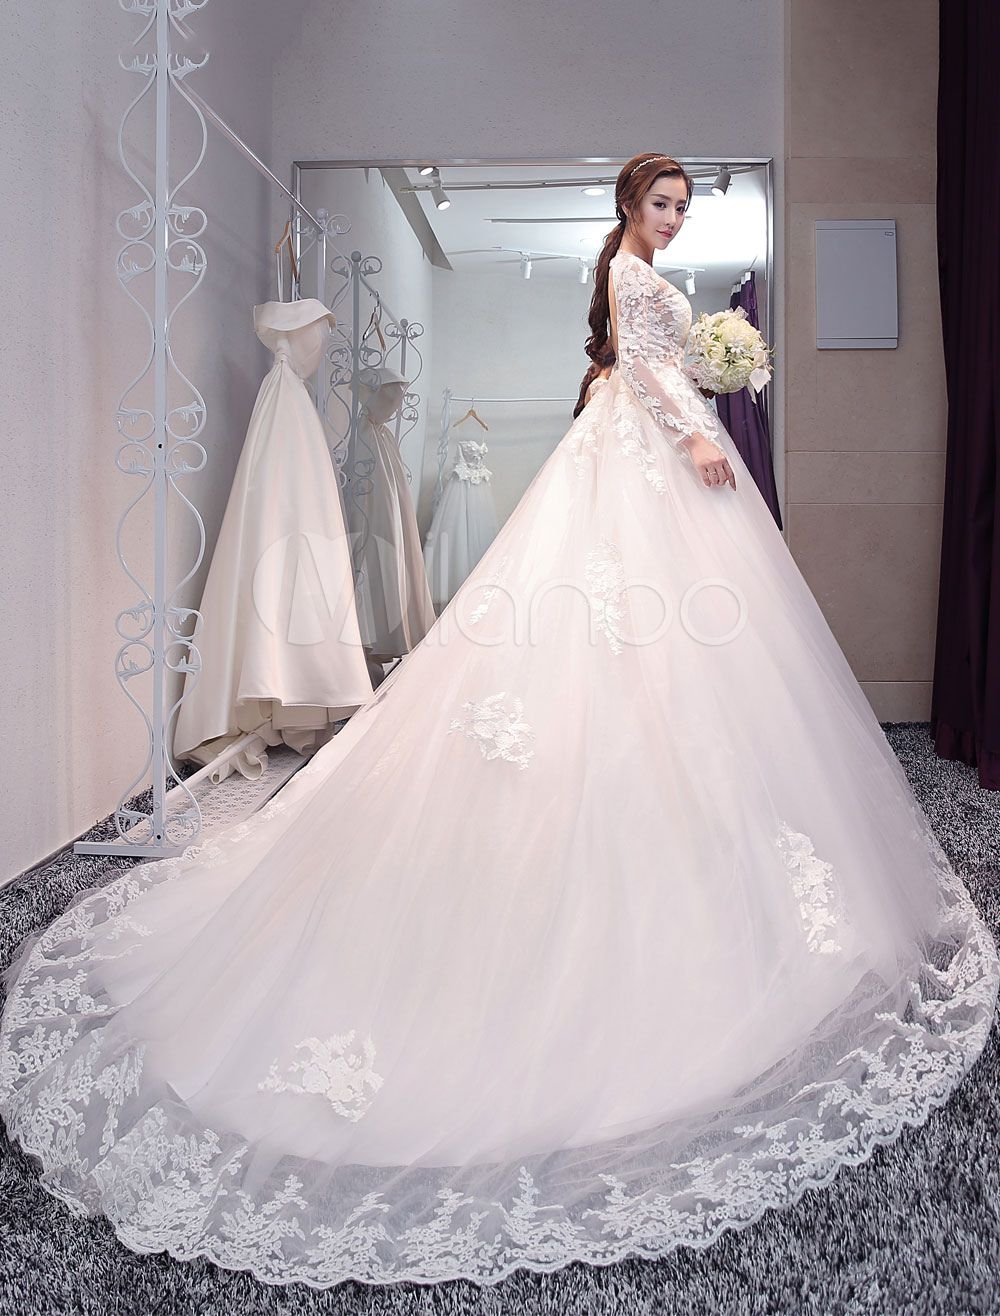 e34ed228b Vestido de novia princesa con escote redondo Sin espaldo con manga larga  Con cola estilo princesa